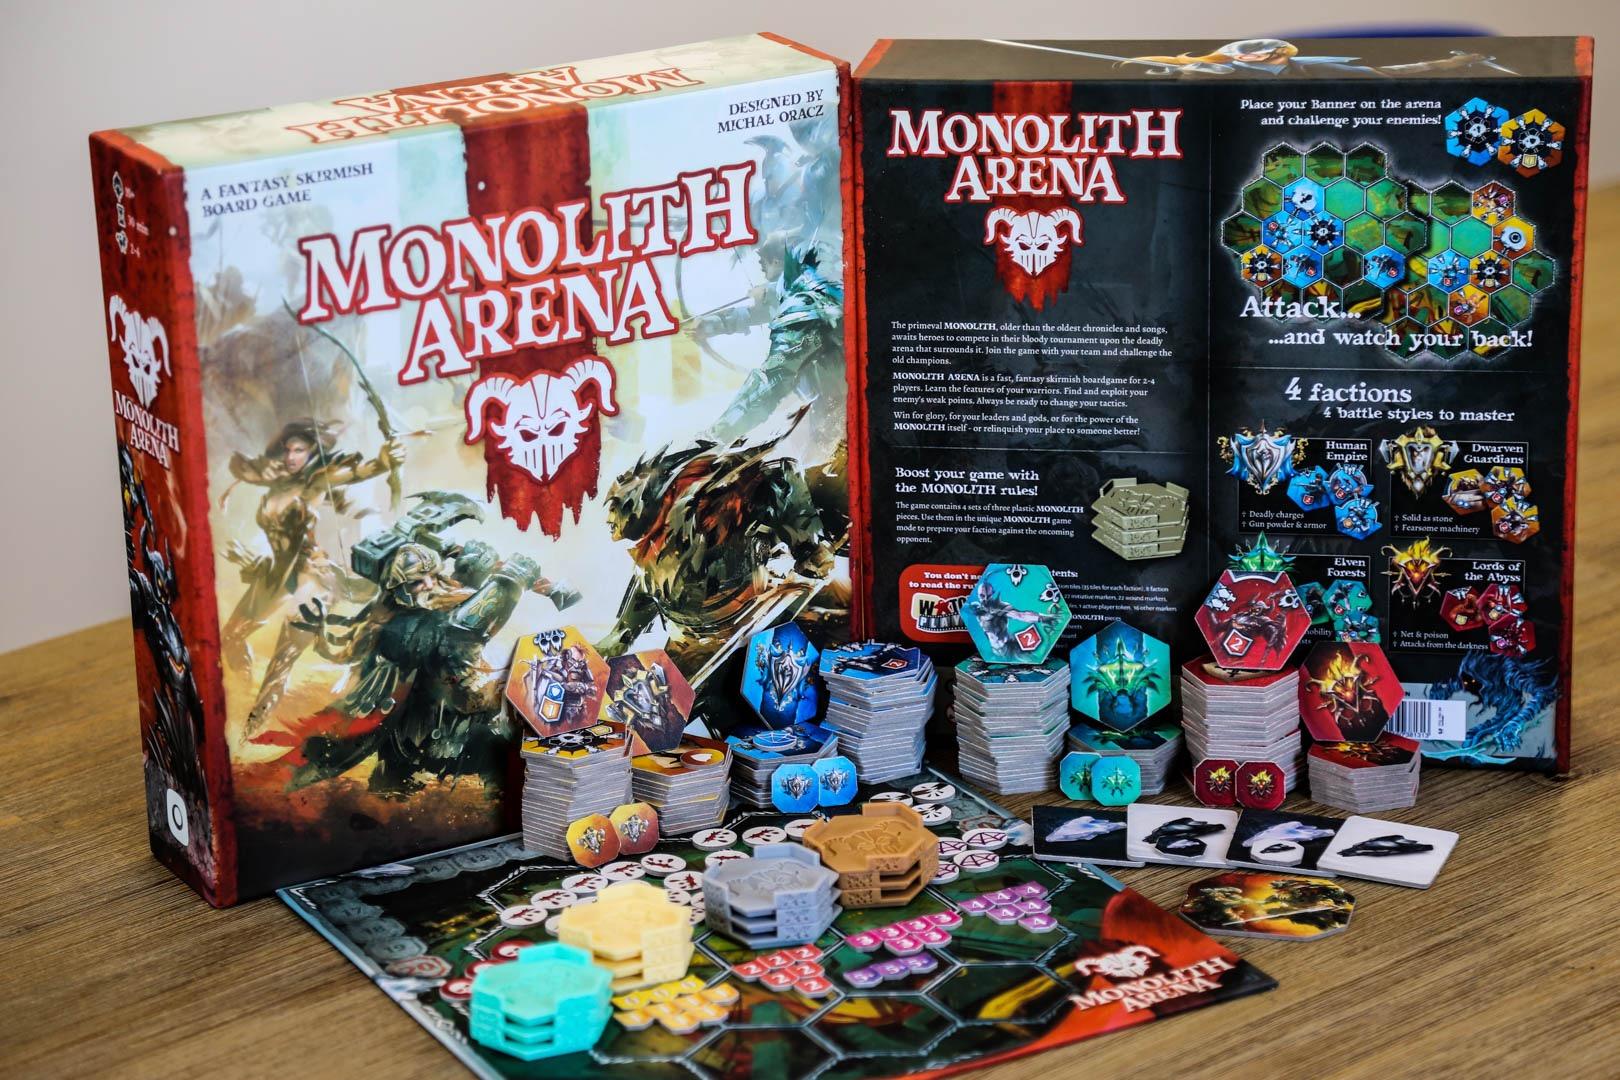 millennium blades x monolith arena level 99 games millennium blades x monolith arena